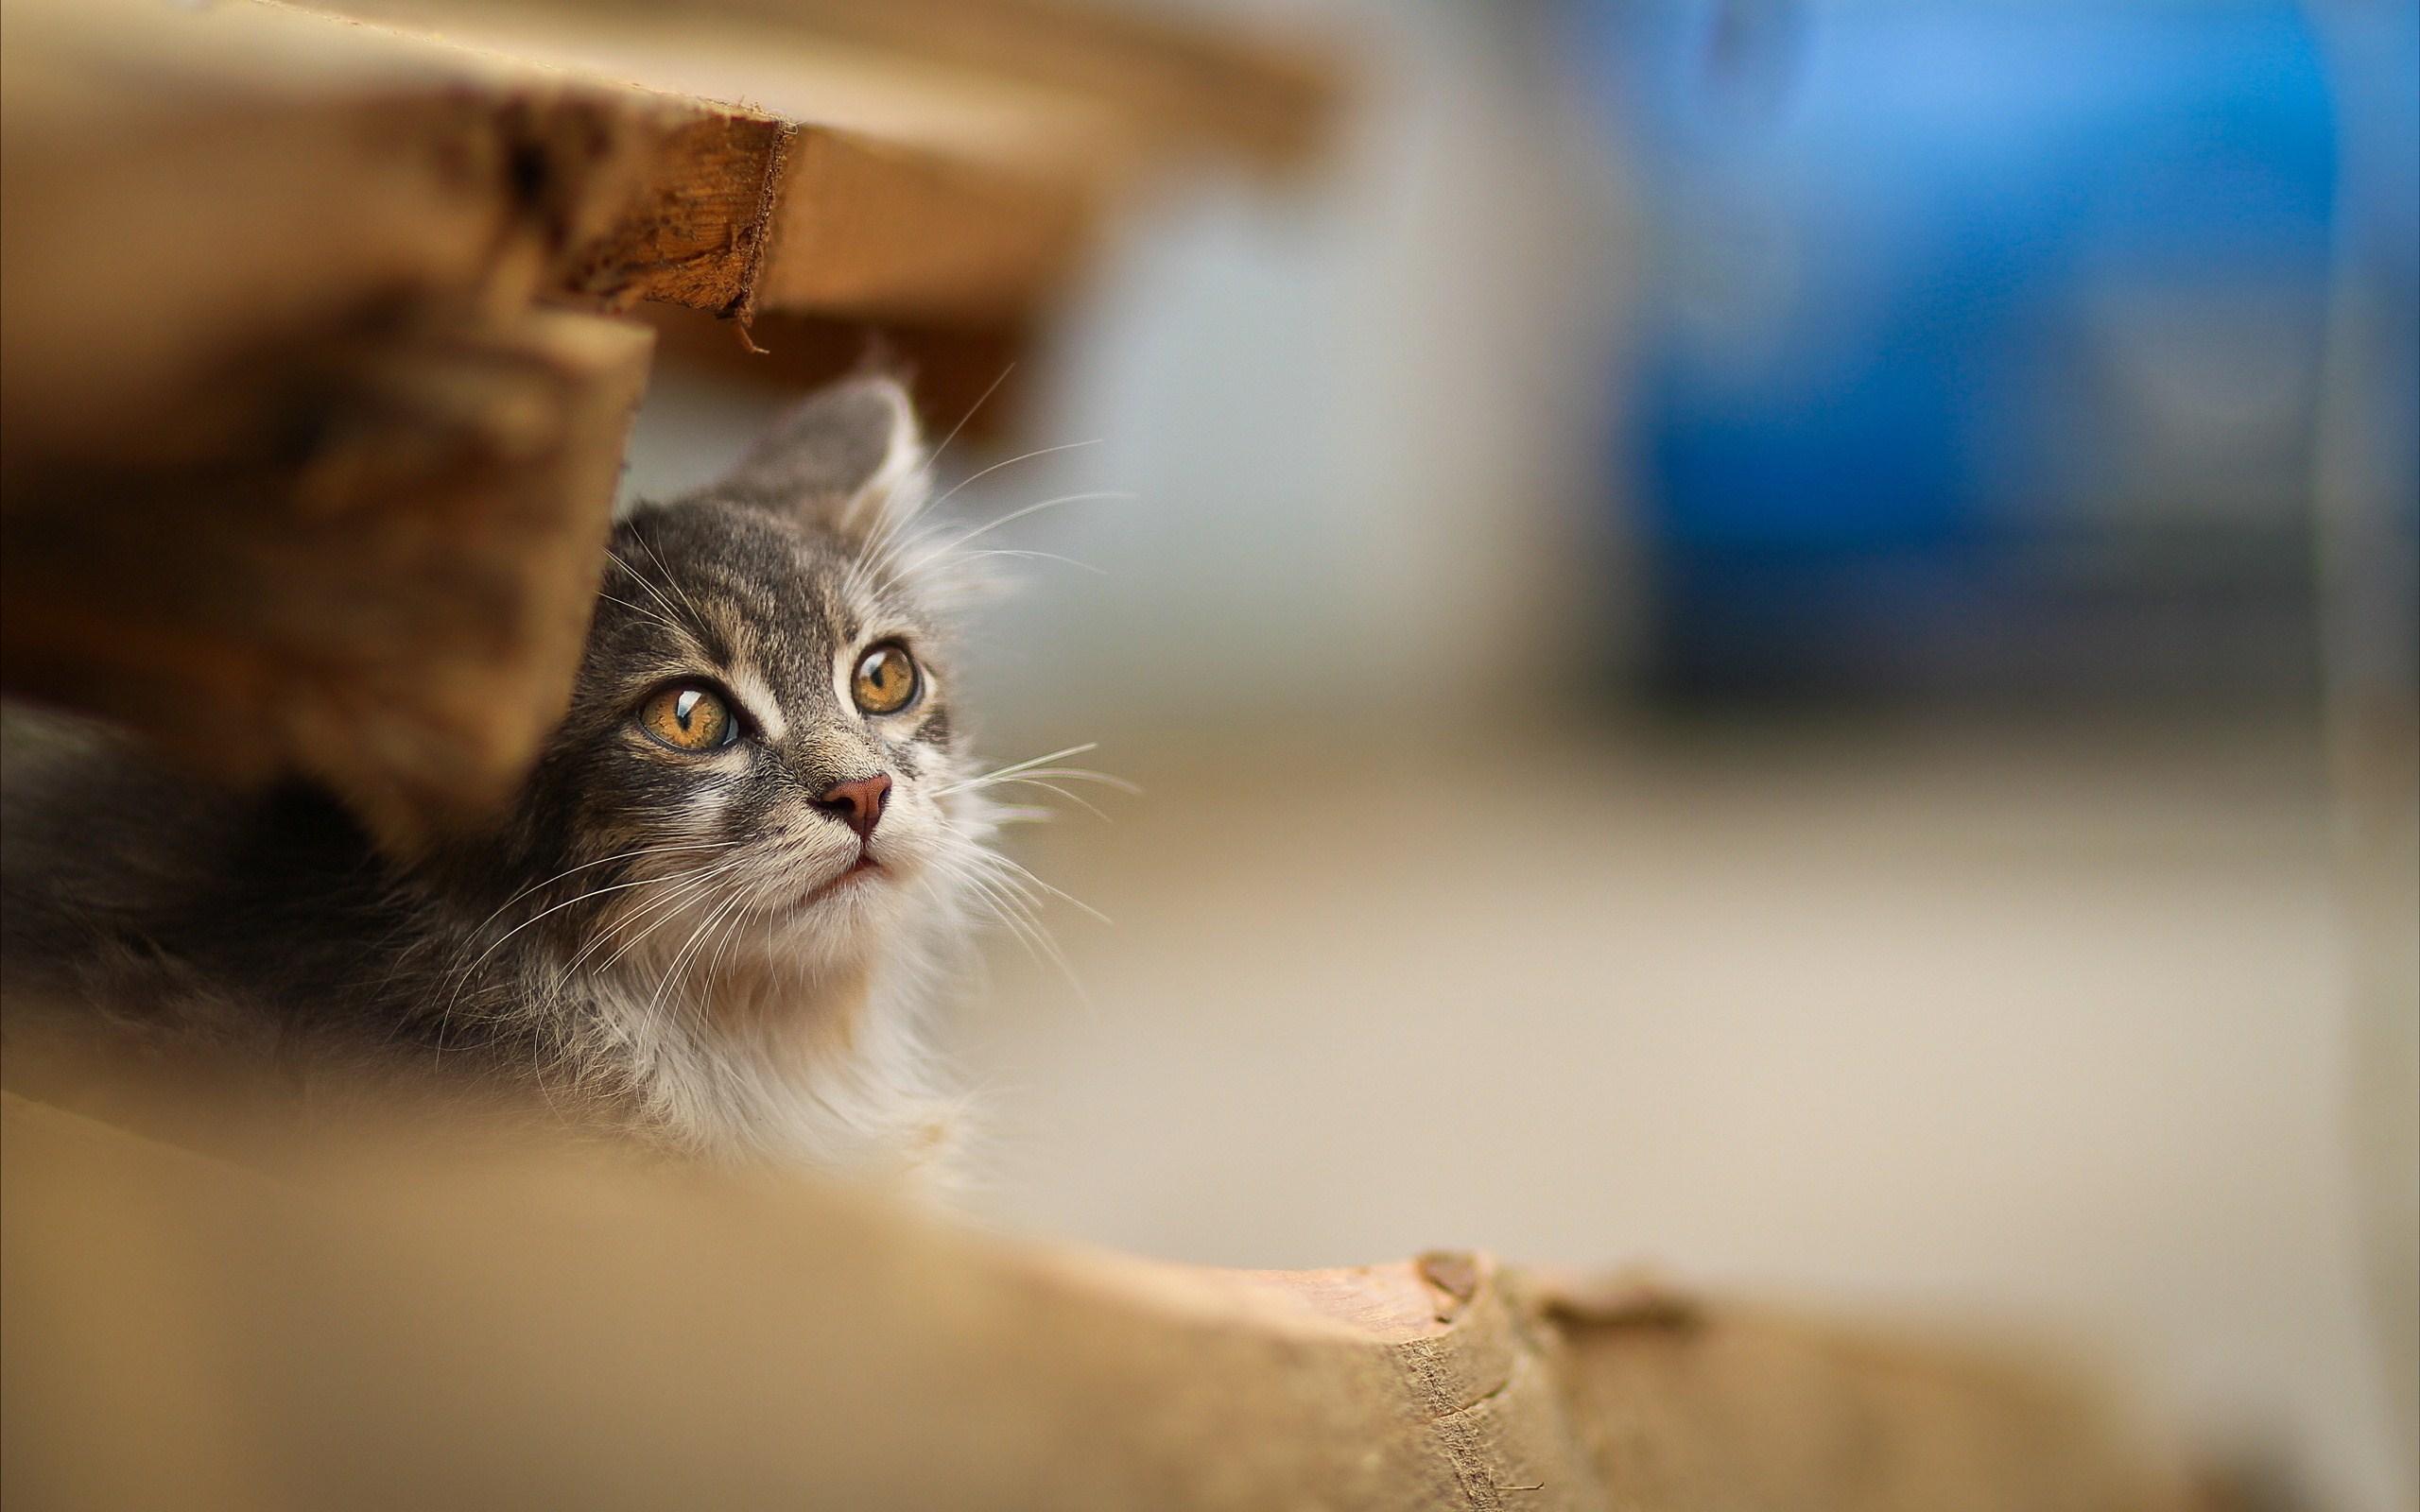 cute cats download - HD Desktop Wallpapers | 4k HD